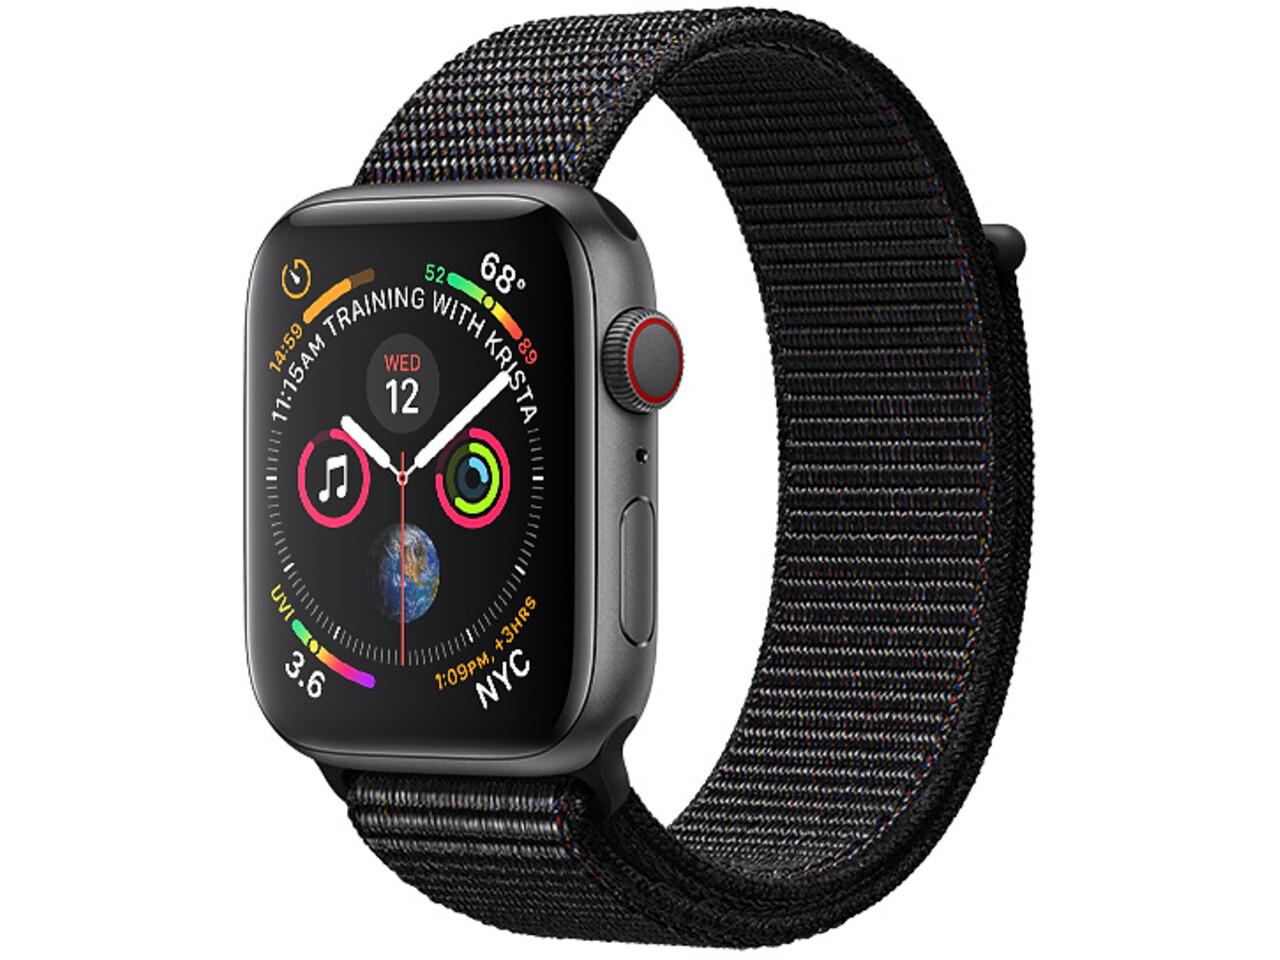 apple watch series 4 cellular 44mm space gray aluminum black sport loop